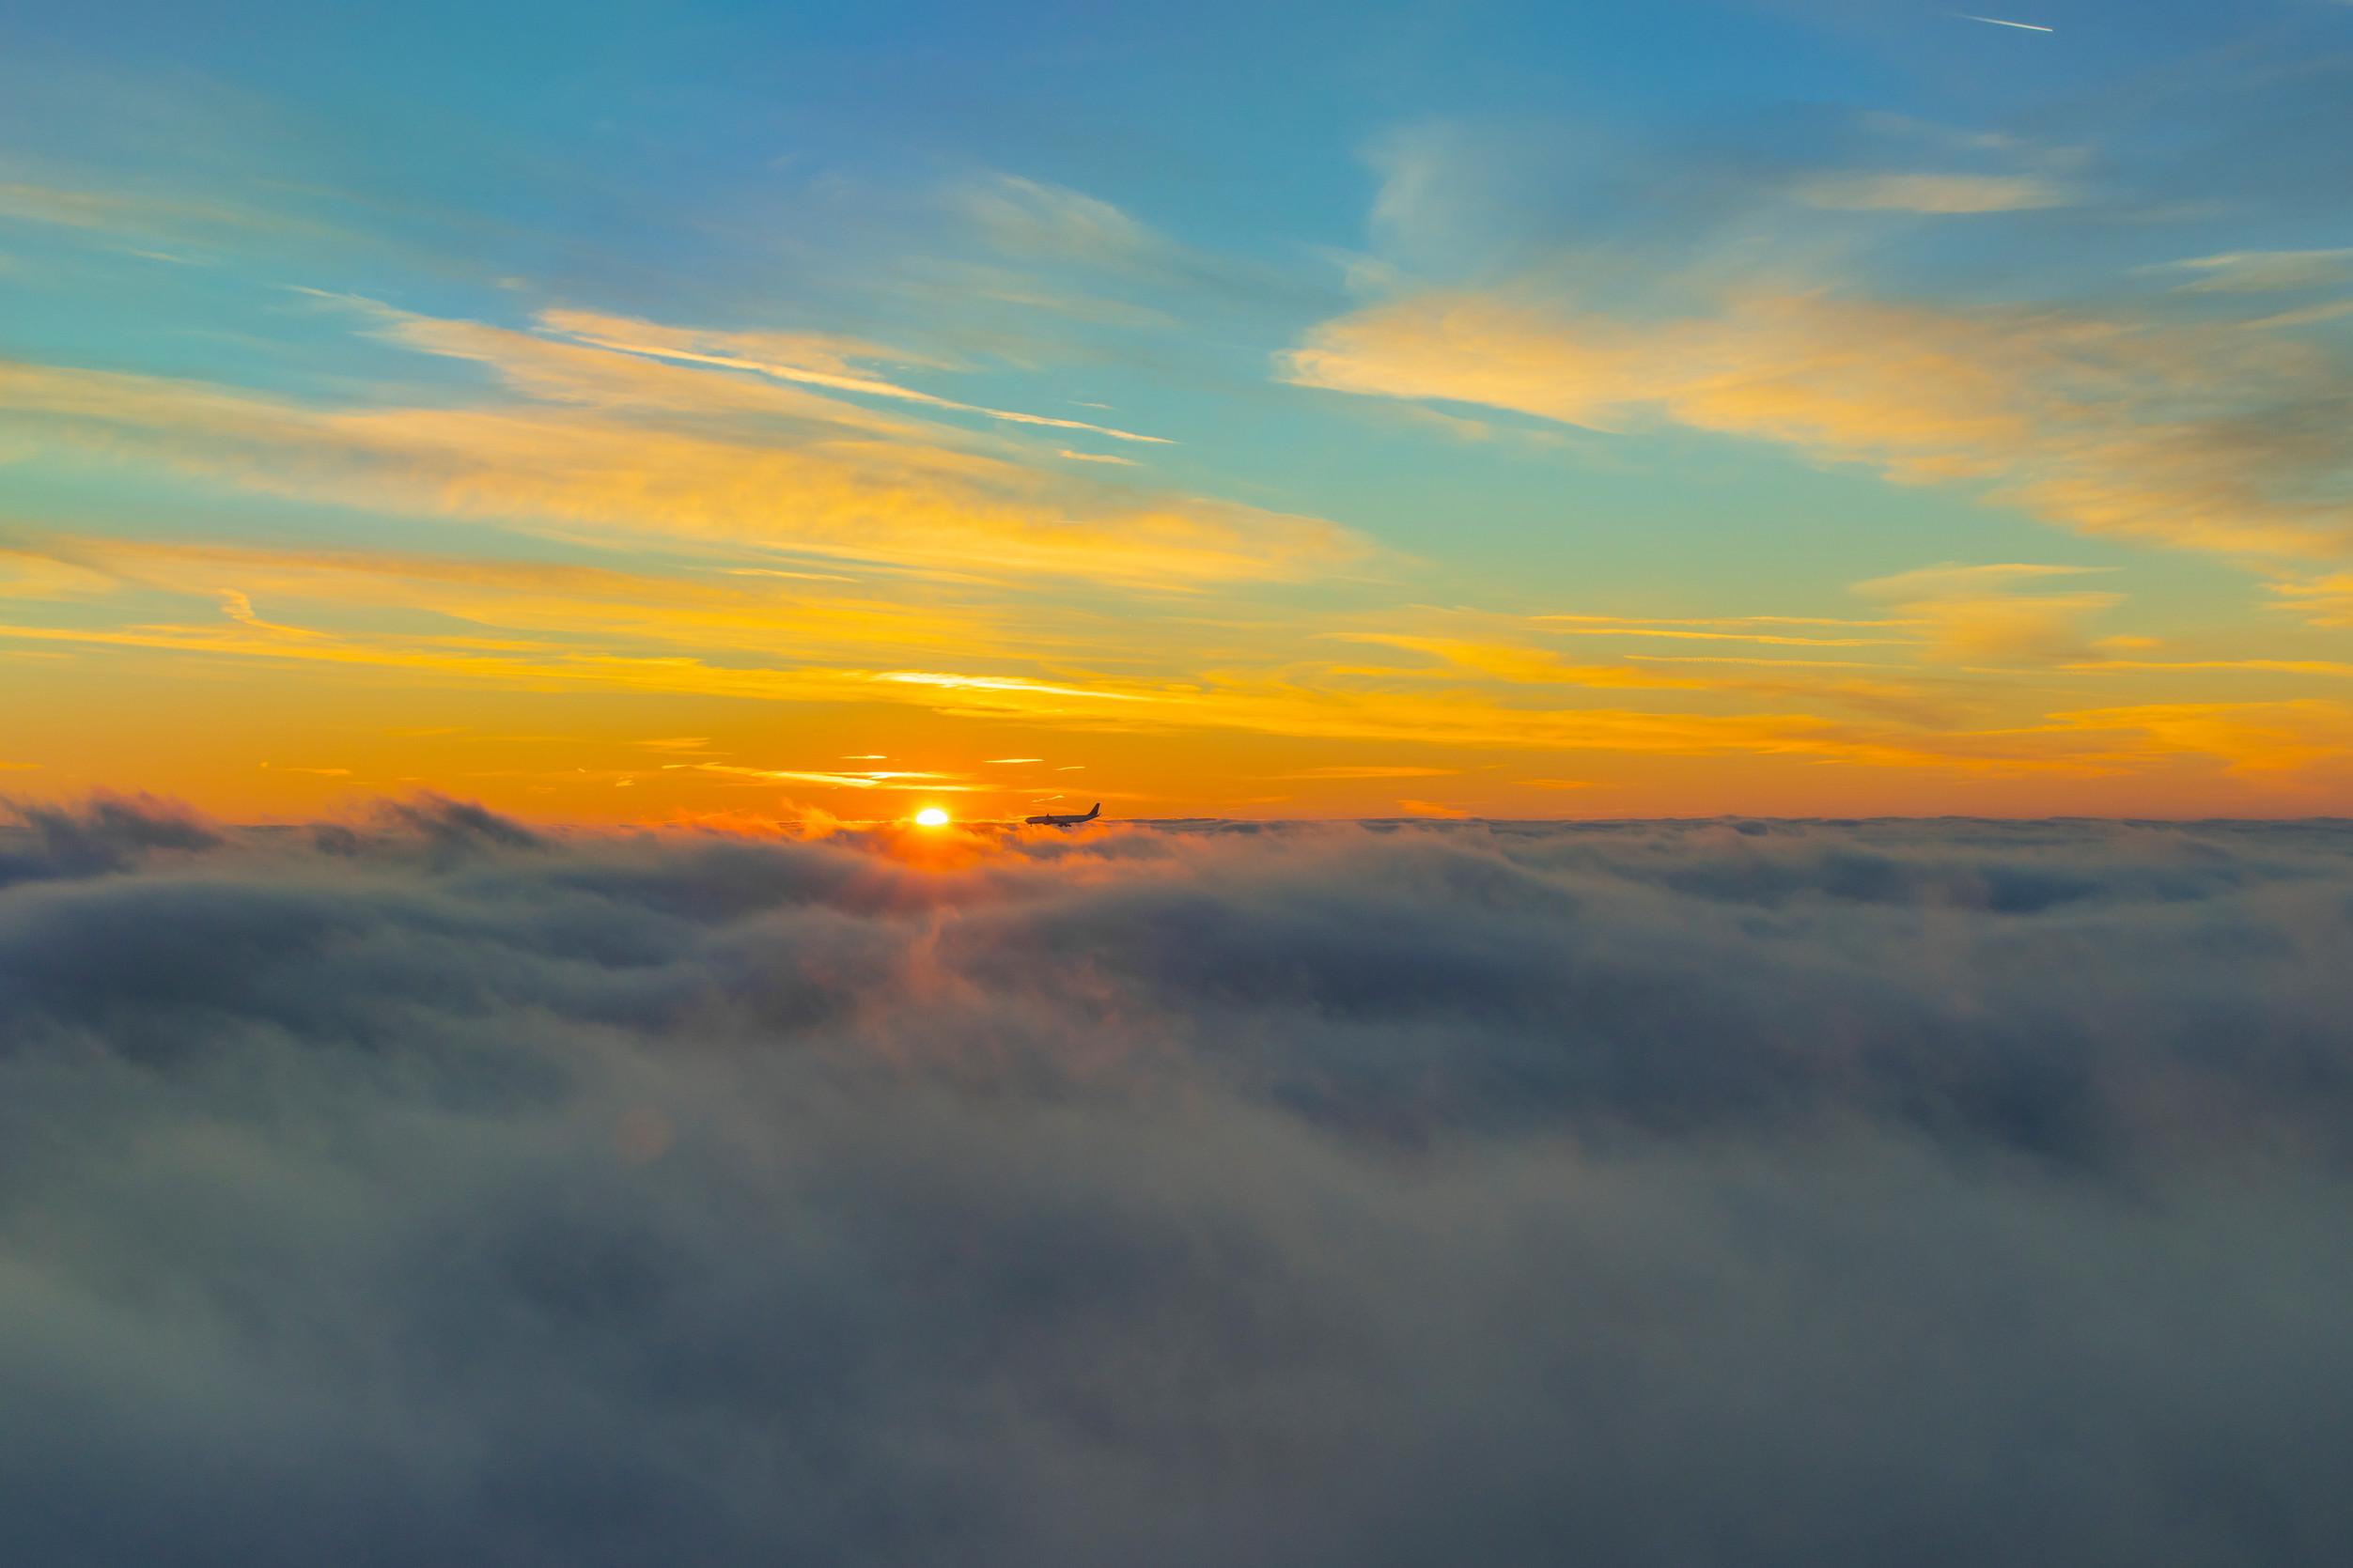 Lufthansa solar fuel plane at sunset